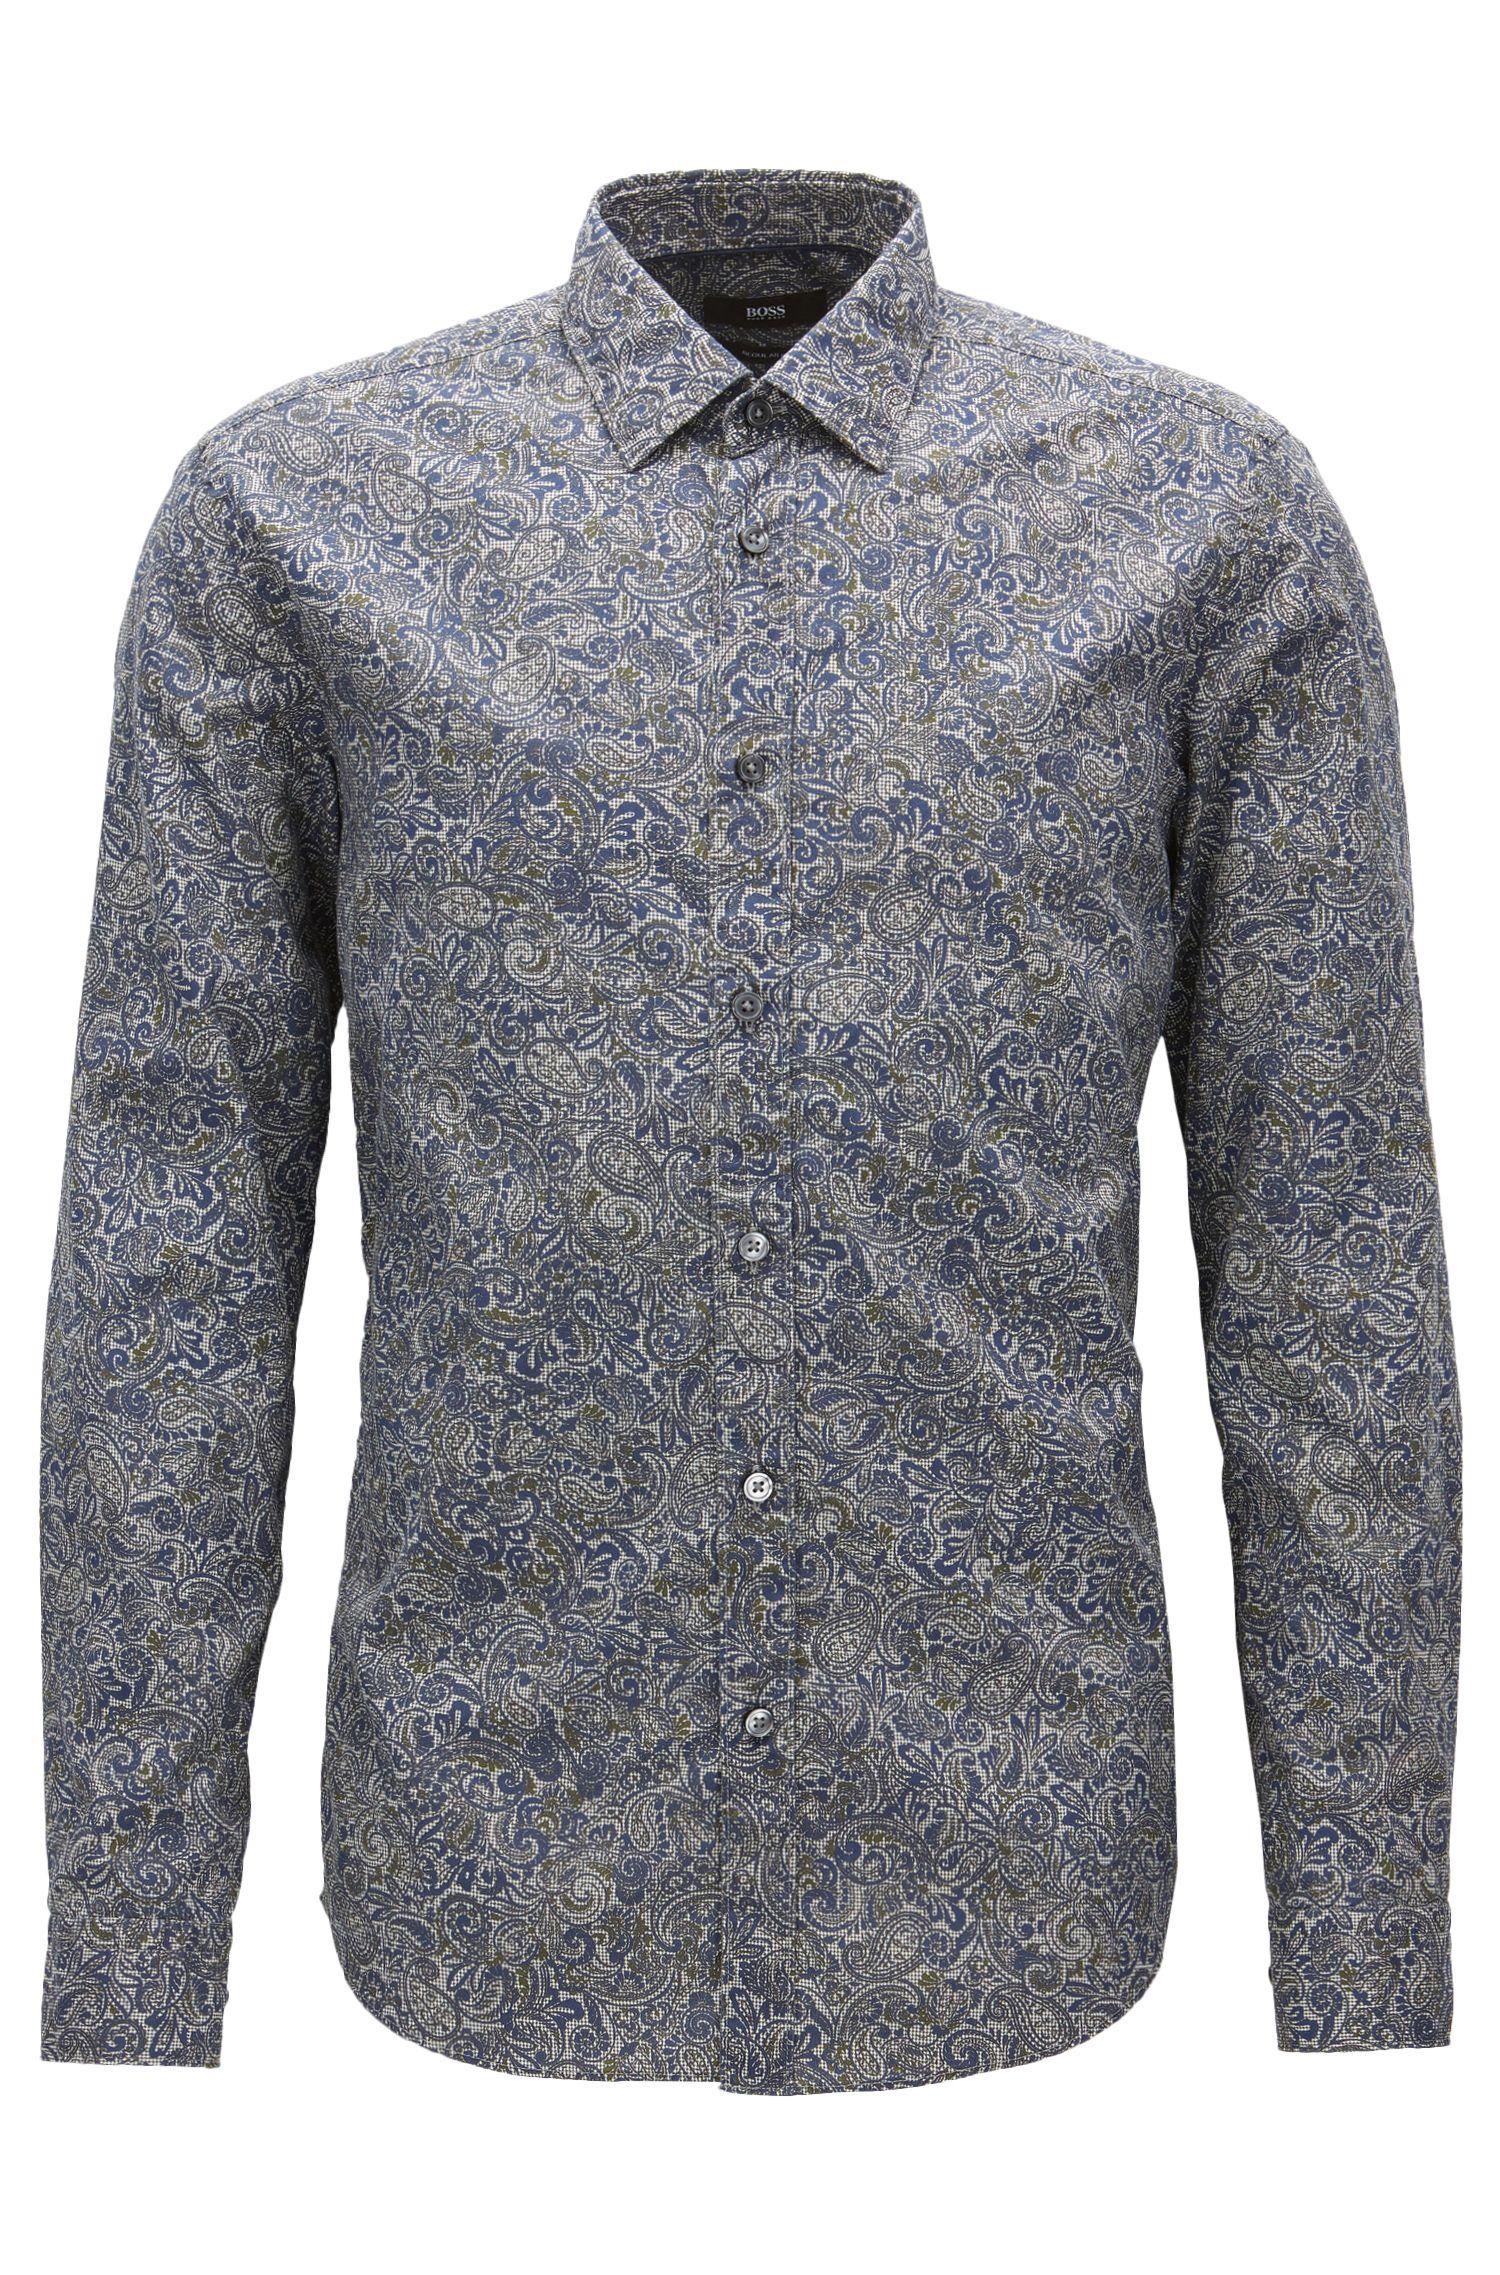 Regular-Fit Hemd aus Baumwolle mit Paisley-Muster